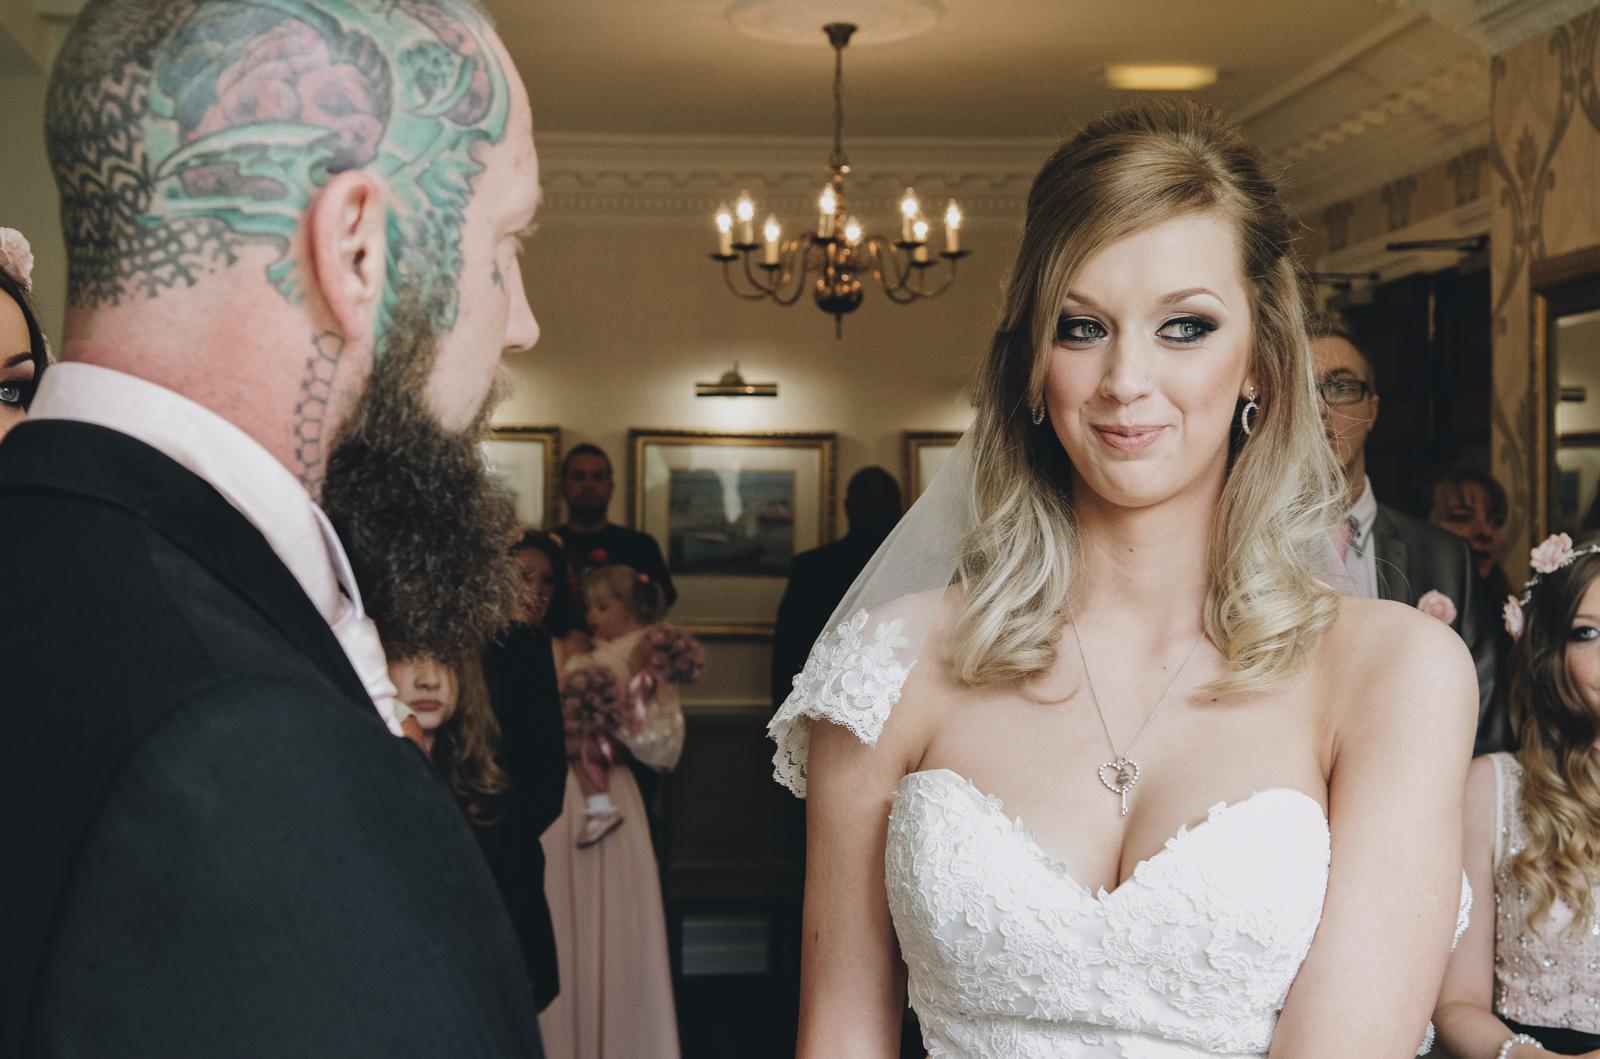 Alternative-North-West-Manchester-Wedding-Photography-Astley-bank-Wedding-skull-cake-tattooed-groom-17.jpg